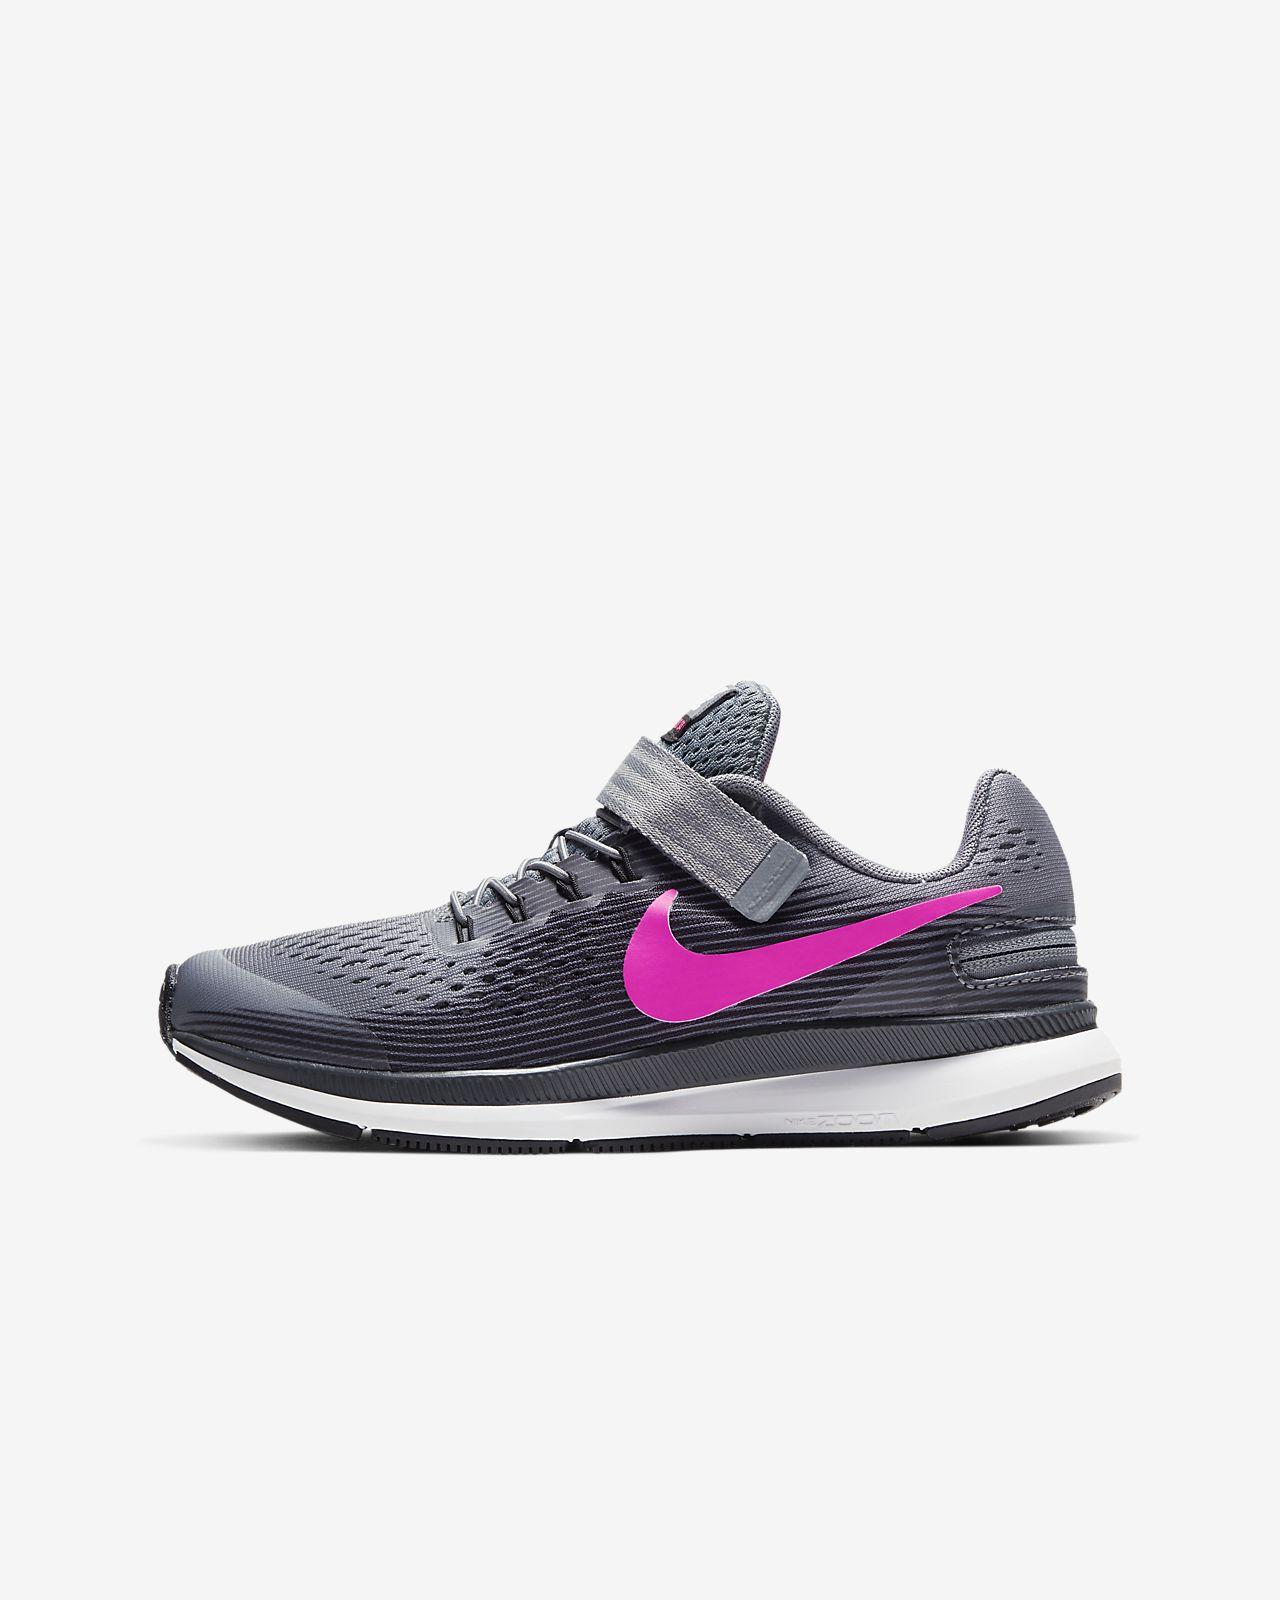 Nike Zoom Pegasus 34 FlyEase futócipő gyerekeknek/nagyobb gyerekeknek